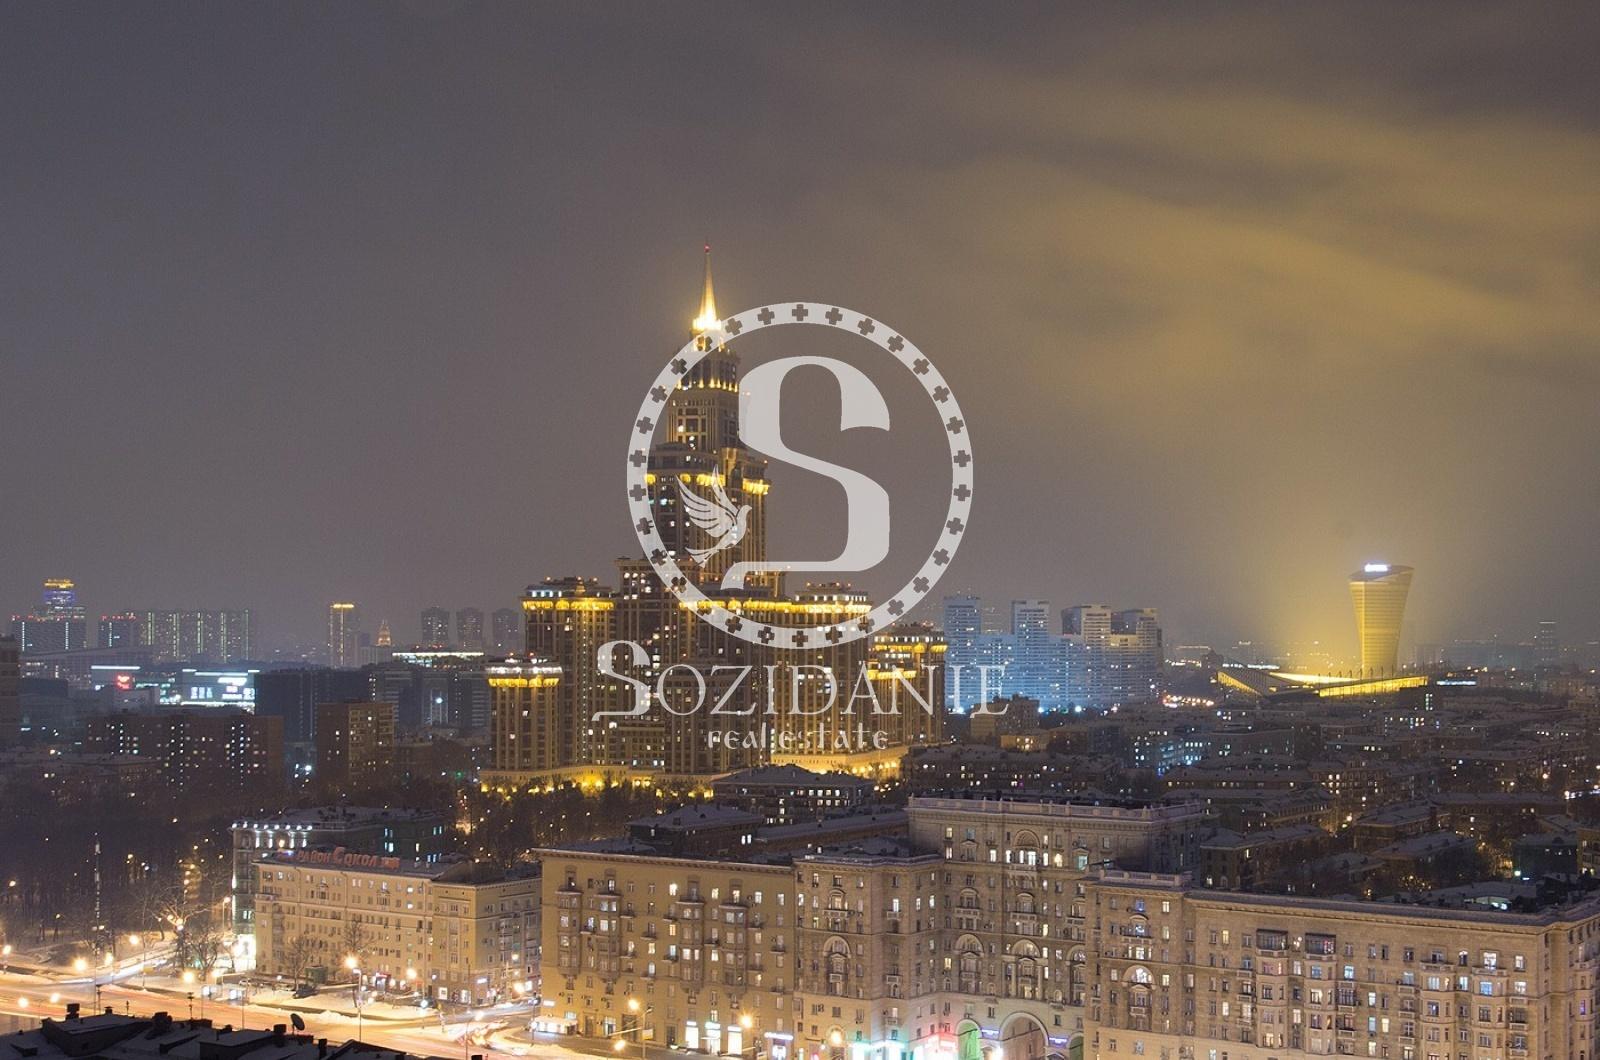 4 Комнаты, Городская, Аренда, Ленинградский проспект, Listing ID 3975, Москва, Россия,